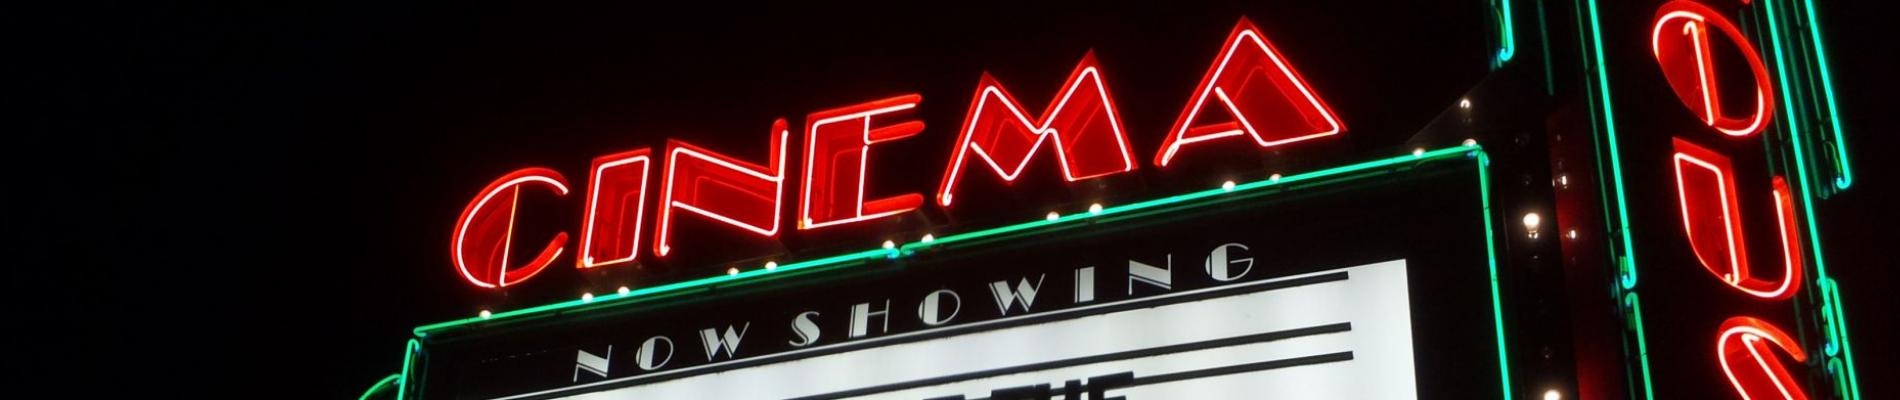 Wednesday Night @ The Movies